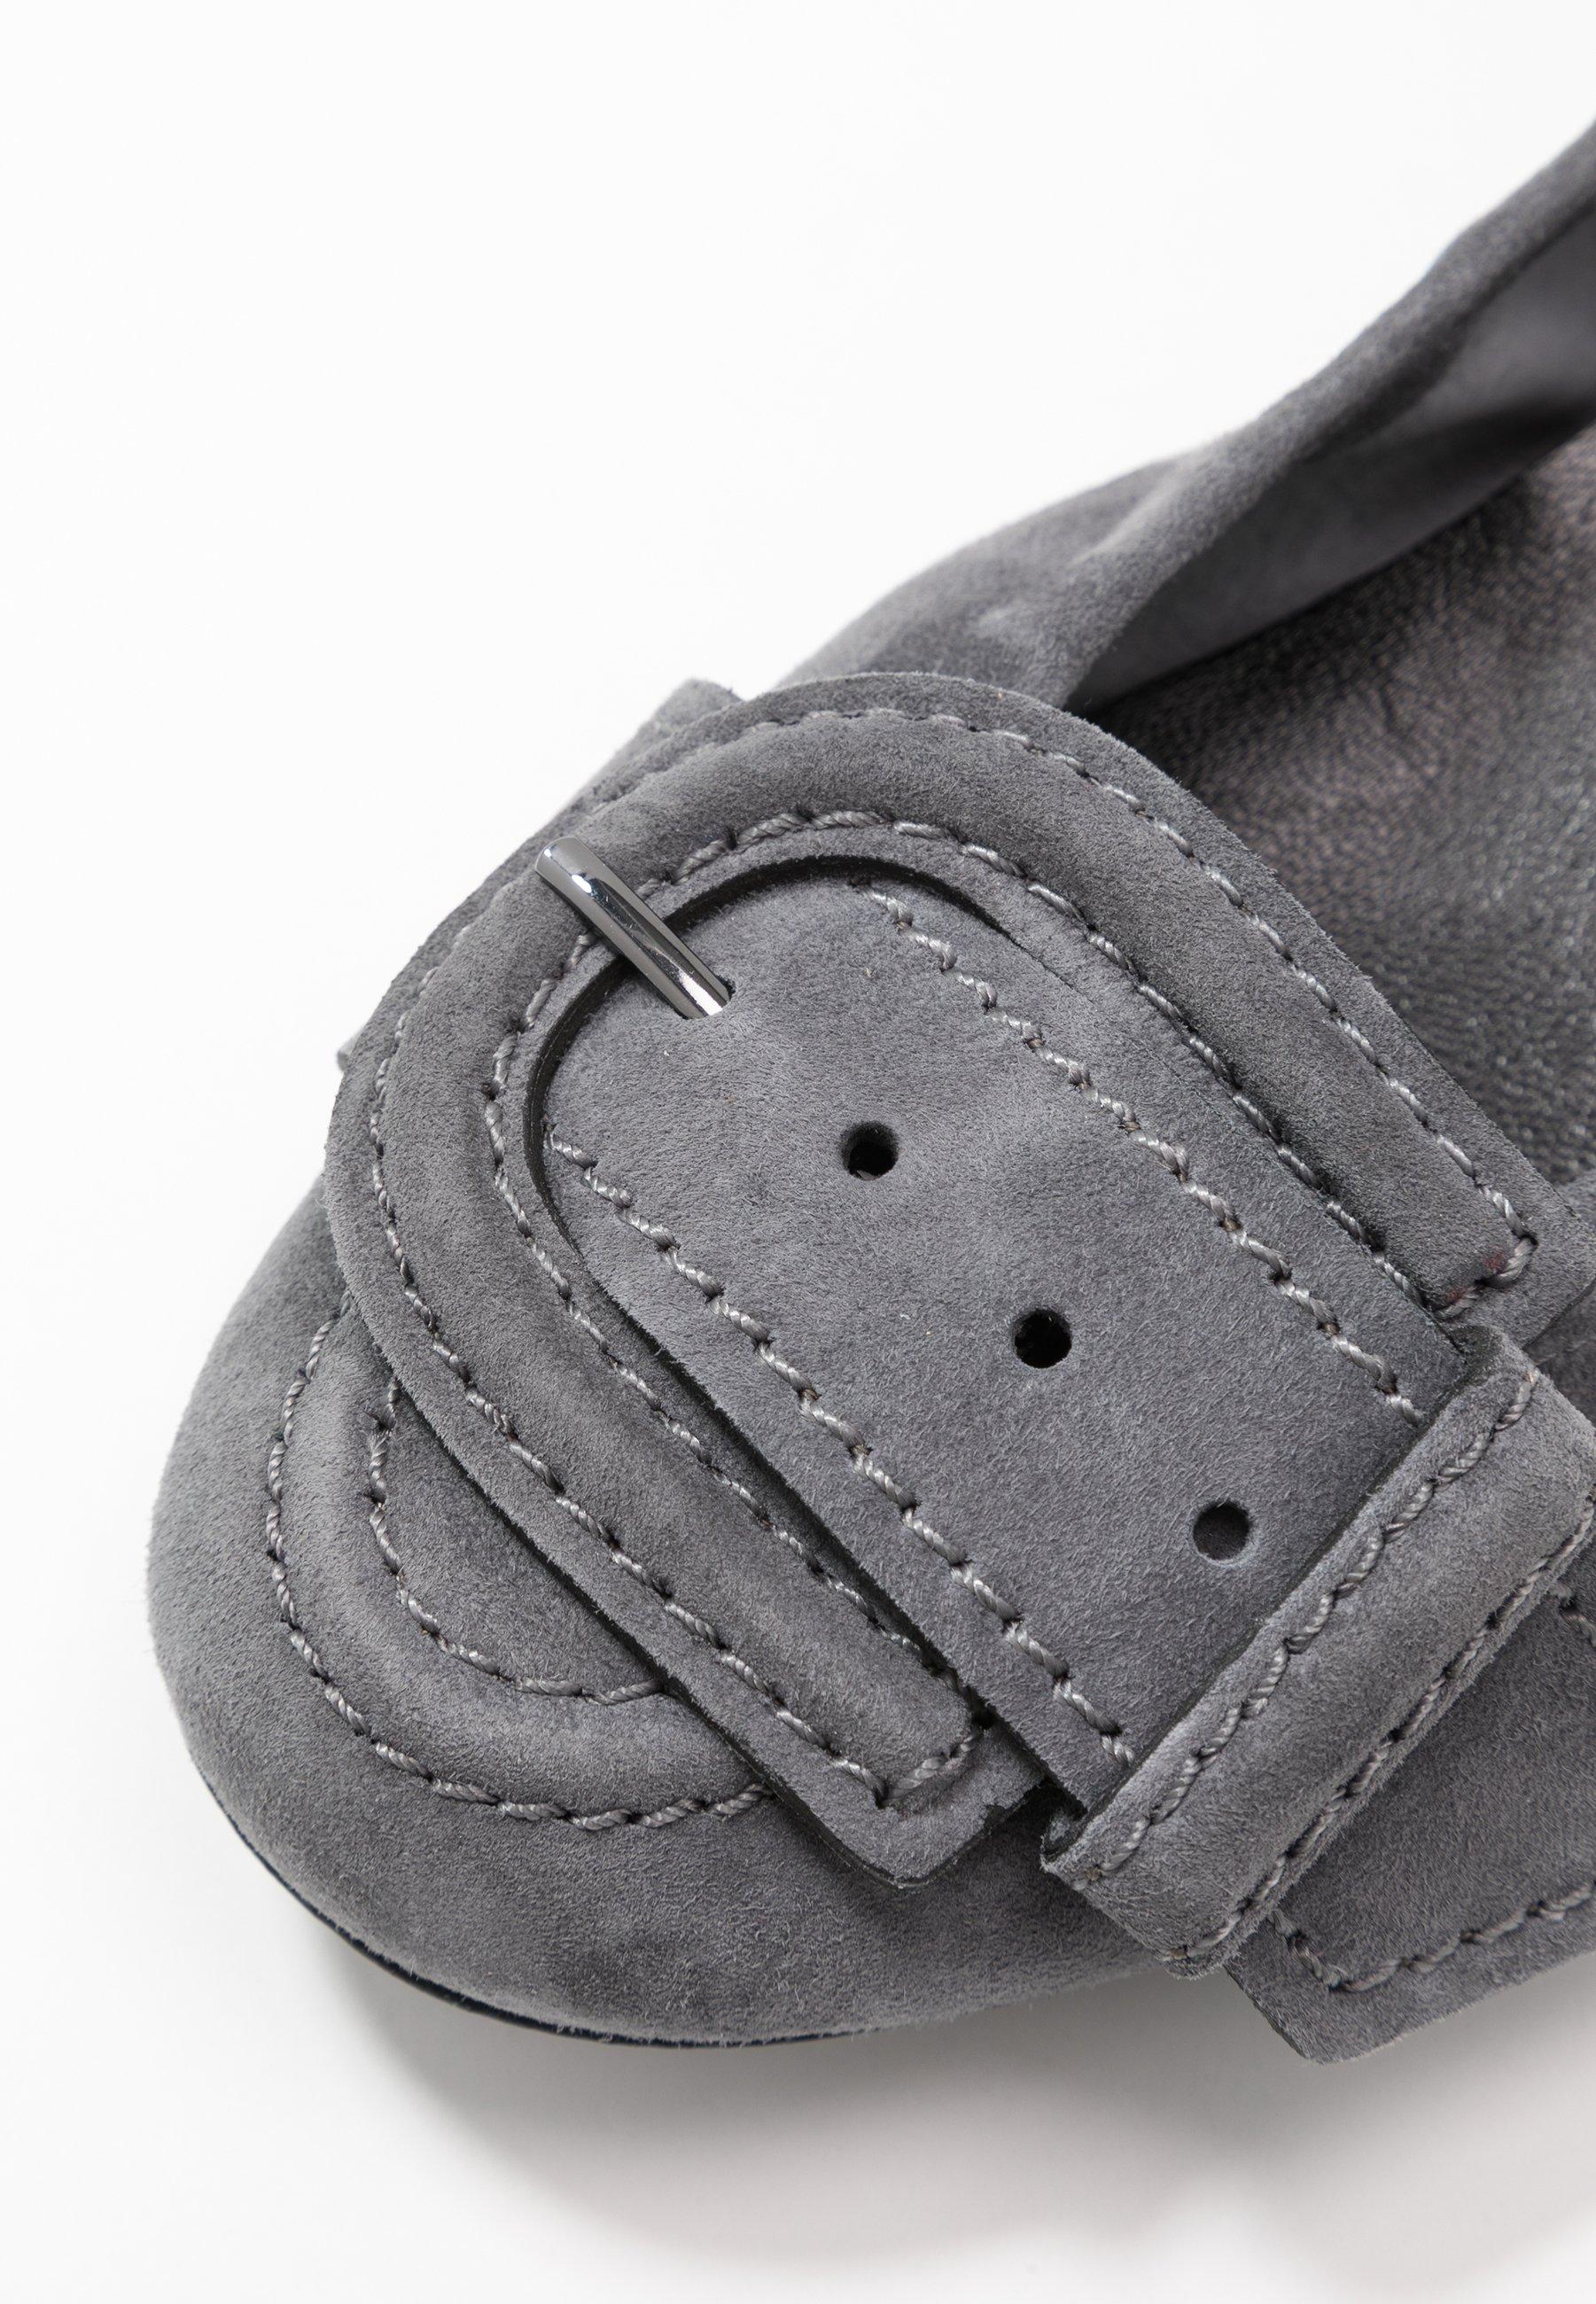 Latest Discount Cheapest Kennel + Schmenger MALU - Ballet pumps - grigio | women's shoes 2020 6Hf1C